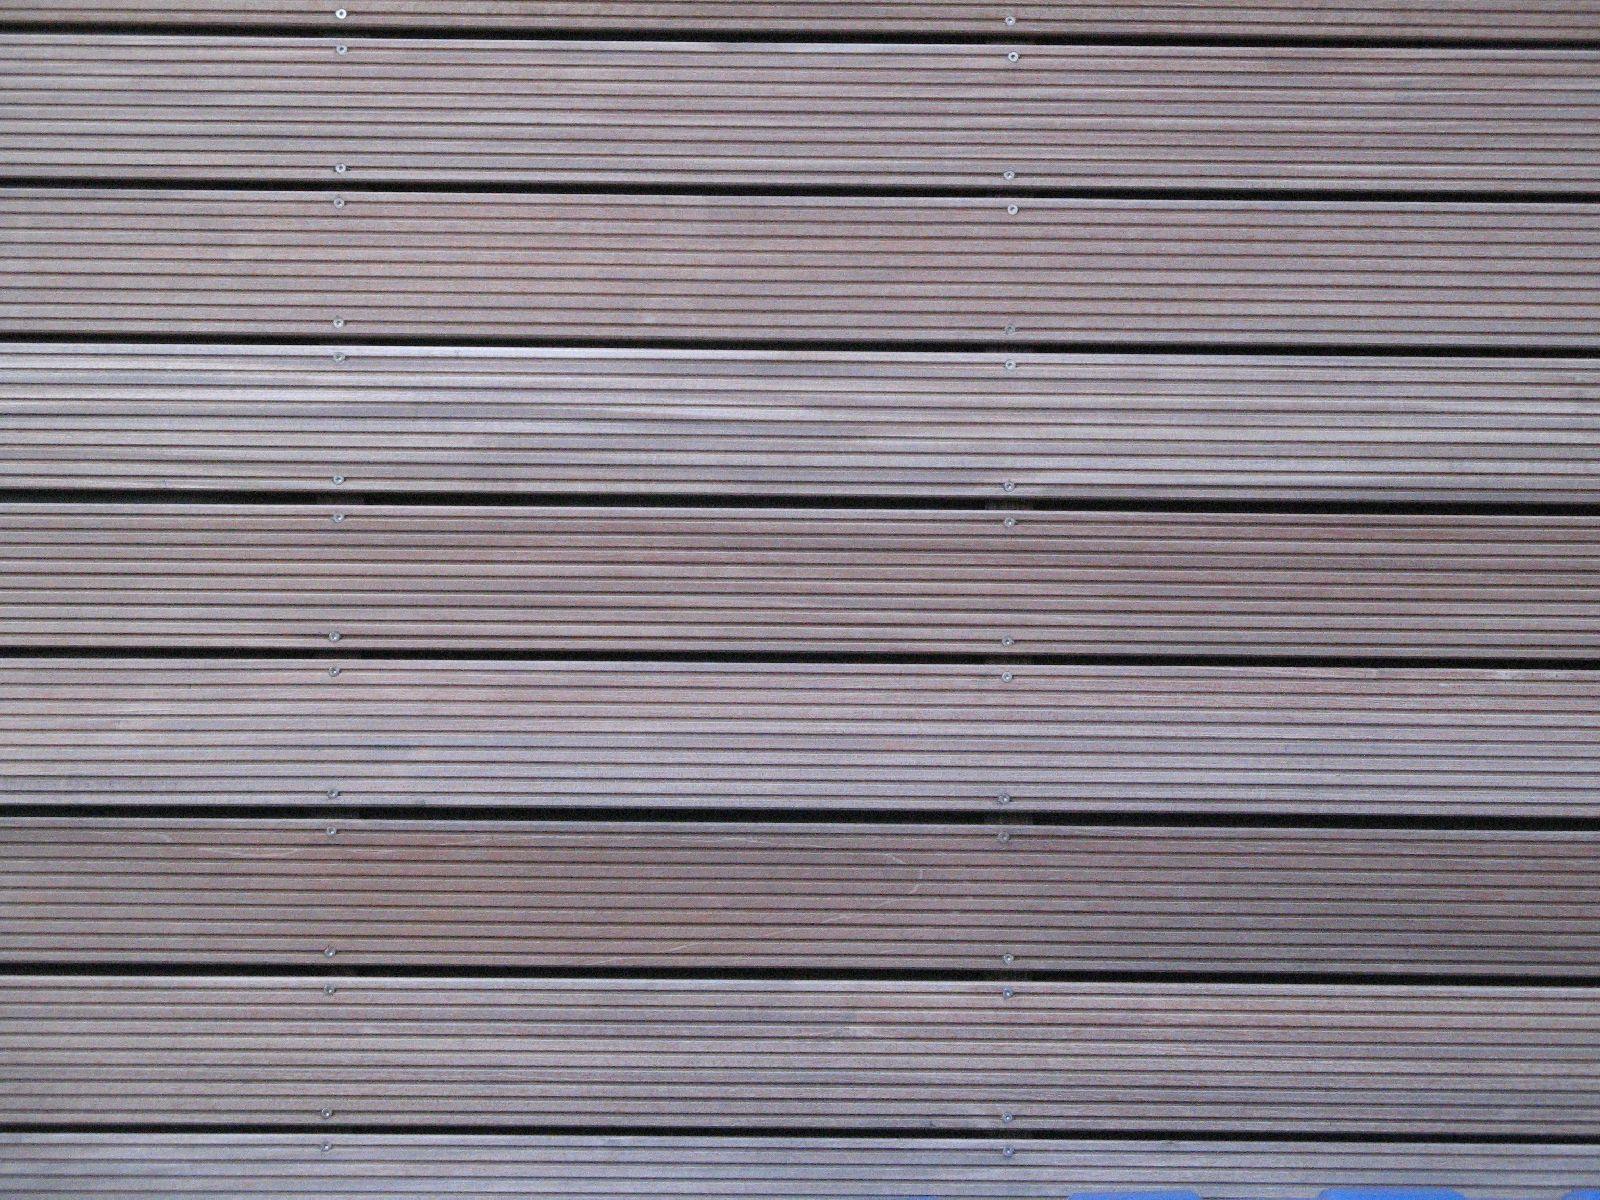 Wood_Textures_B_5774